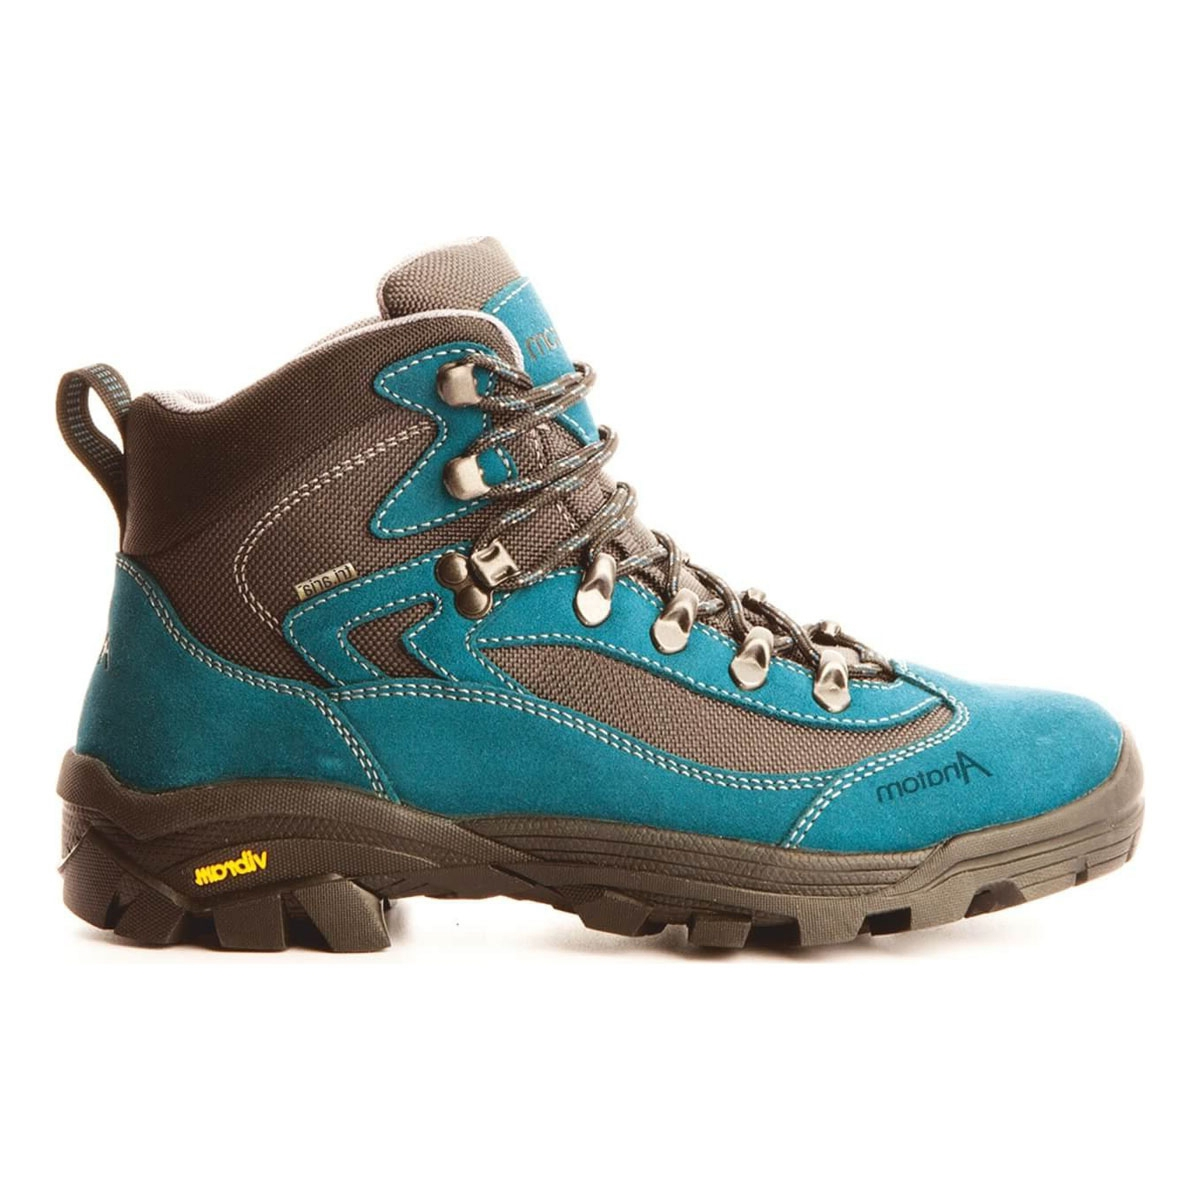 5623d298e0a Anatom V2 Lomond Walking Boots (Women's) - Teal